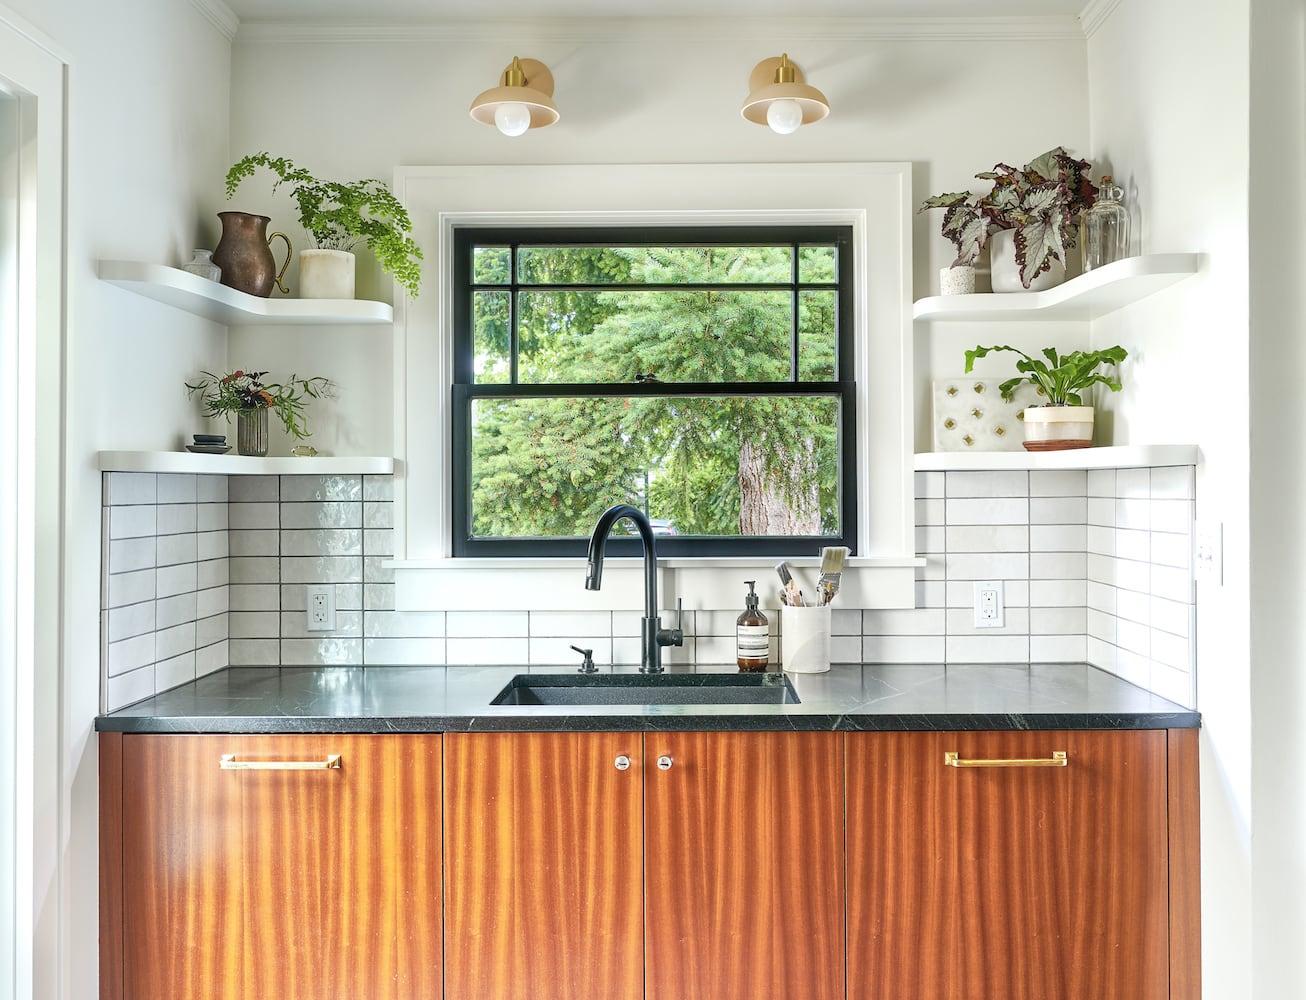 Sink area with black plumbing fixtures, black windows, decorative sconces